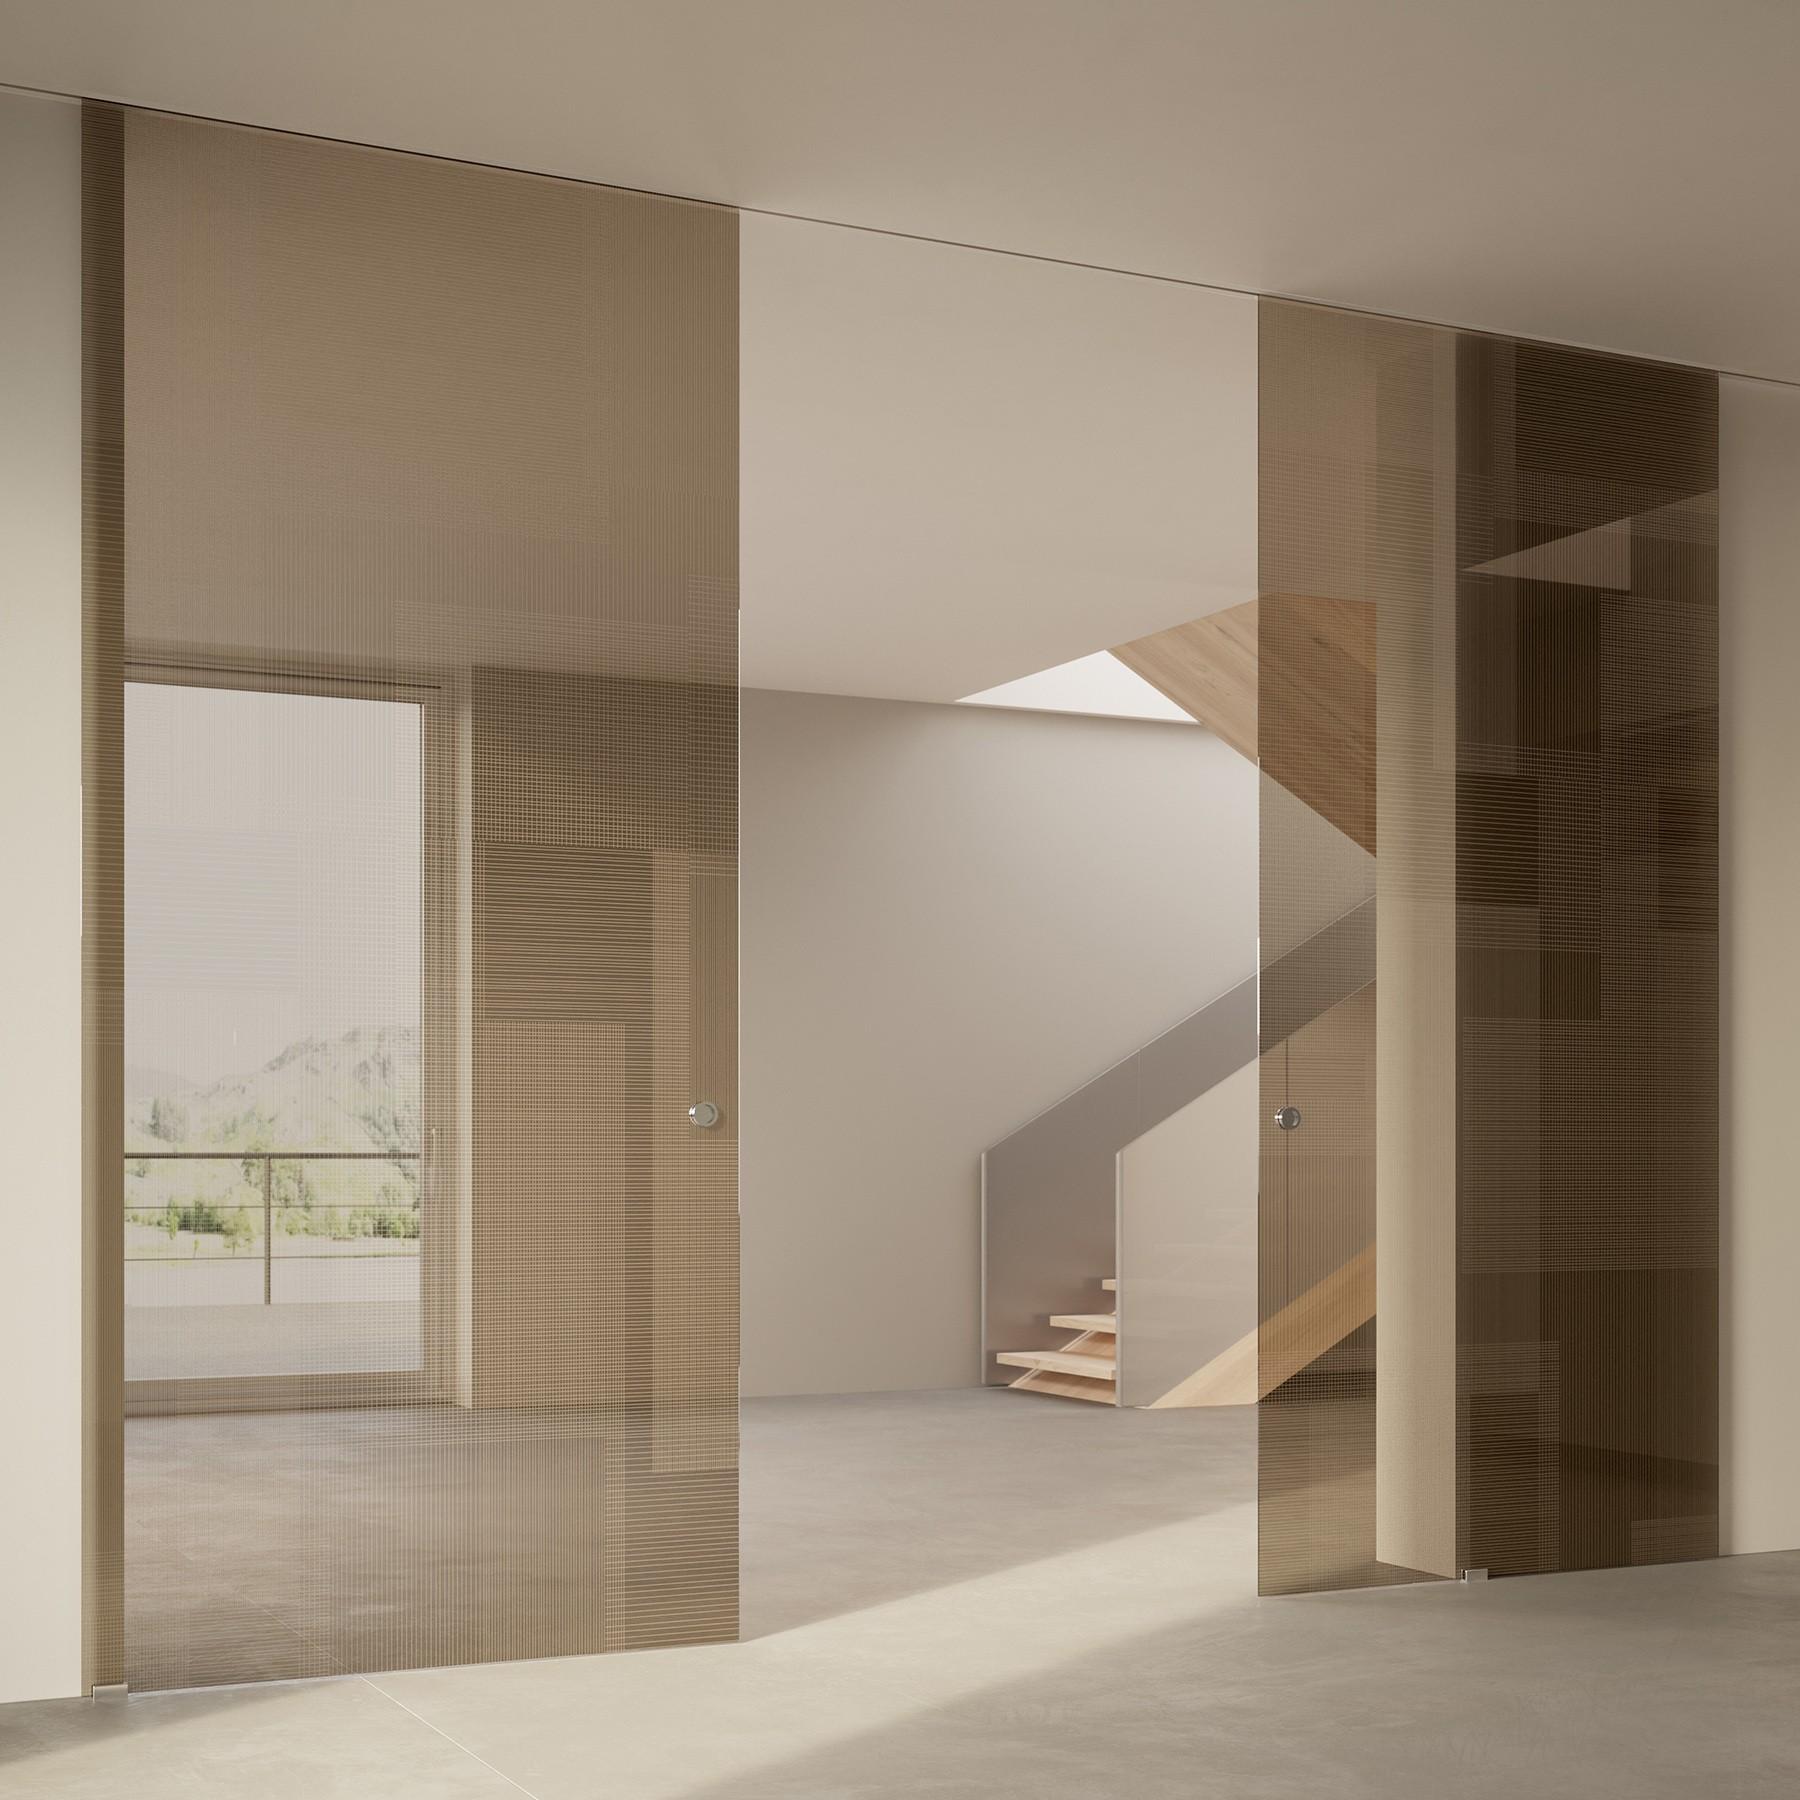 Scenario Visio Up with BIT 03 trasparente bronzo glass